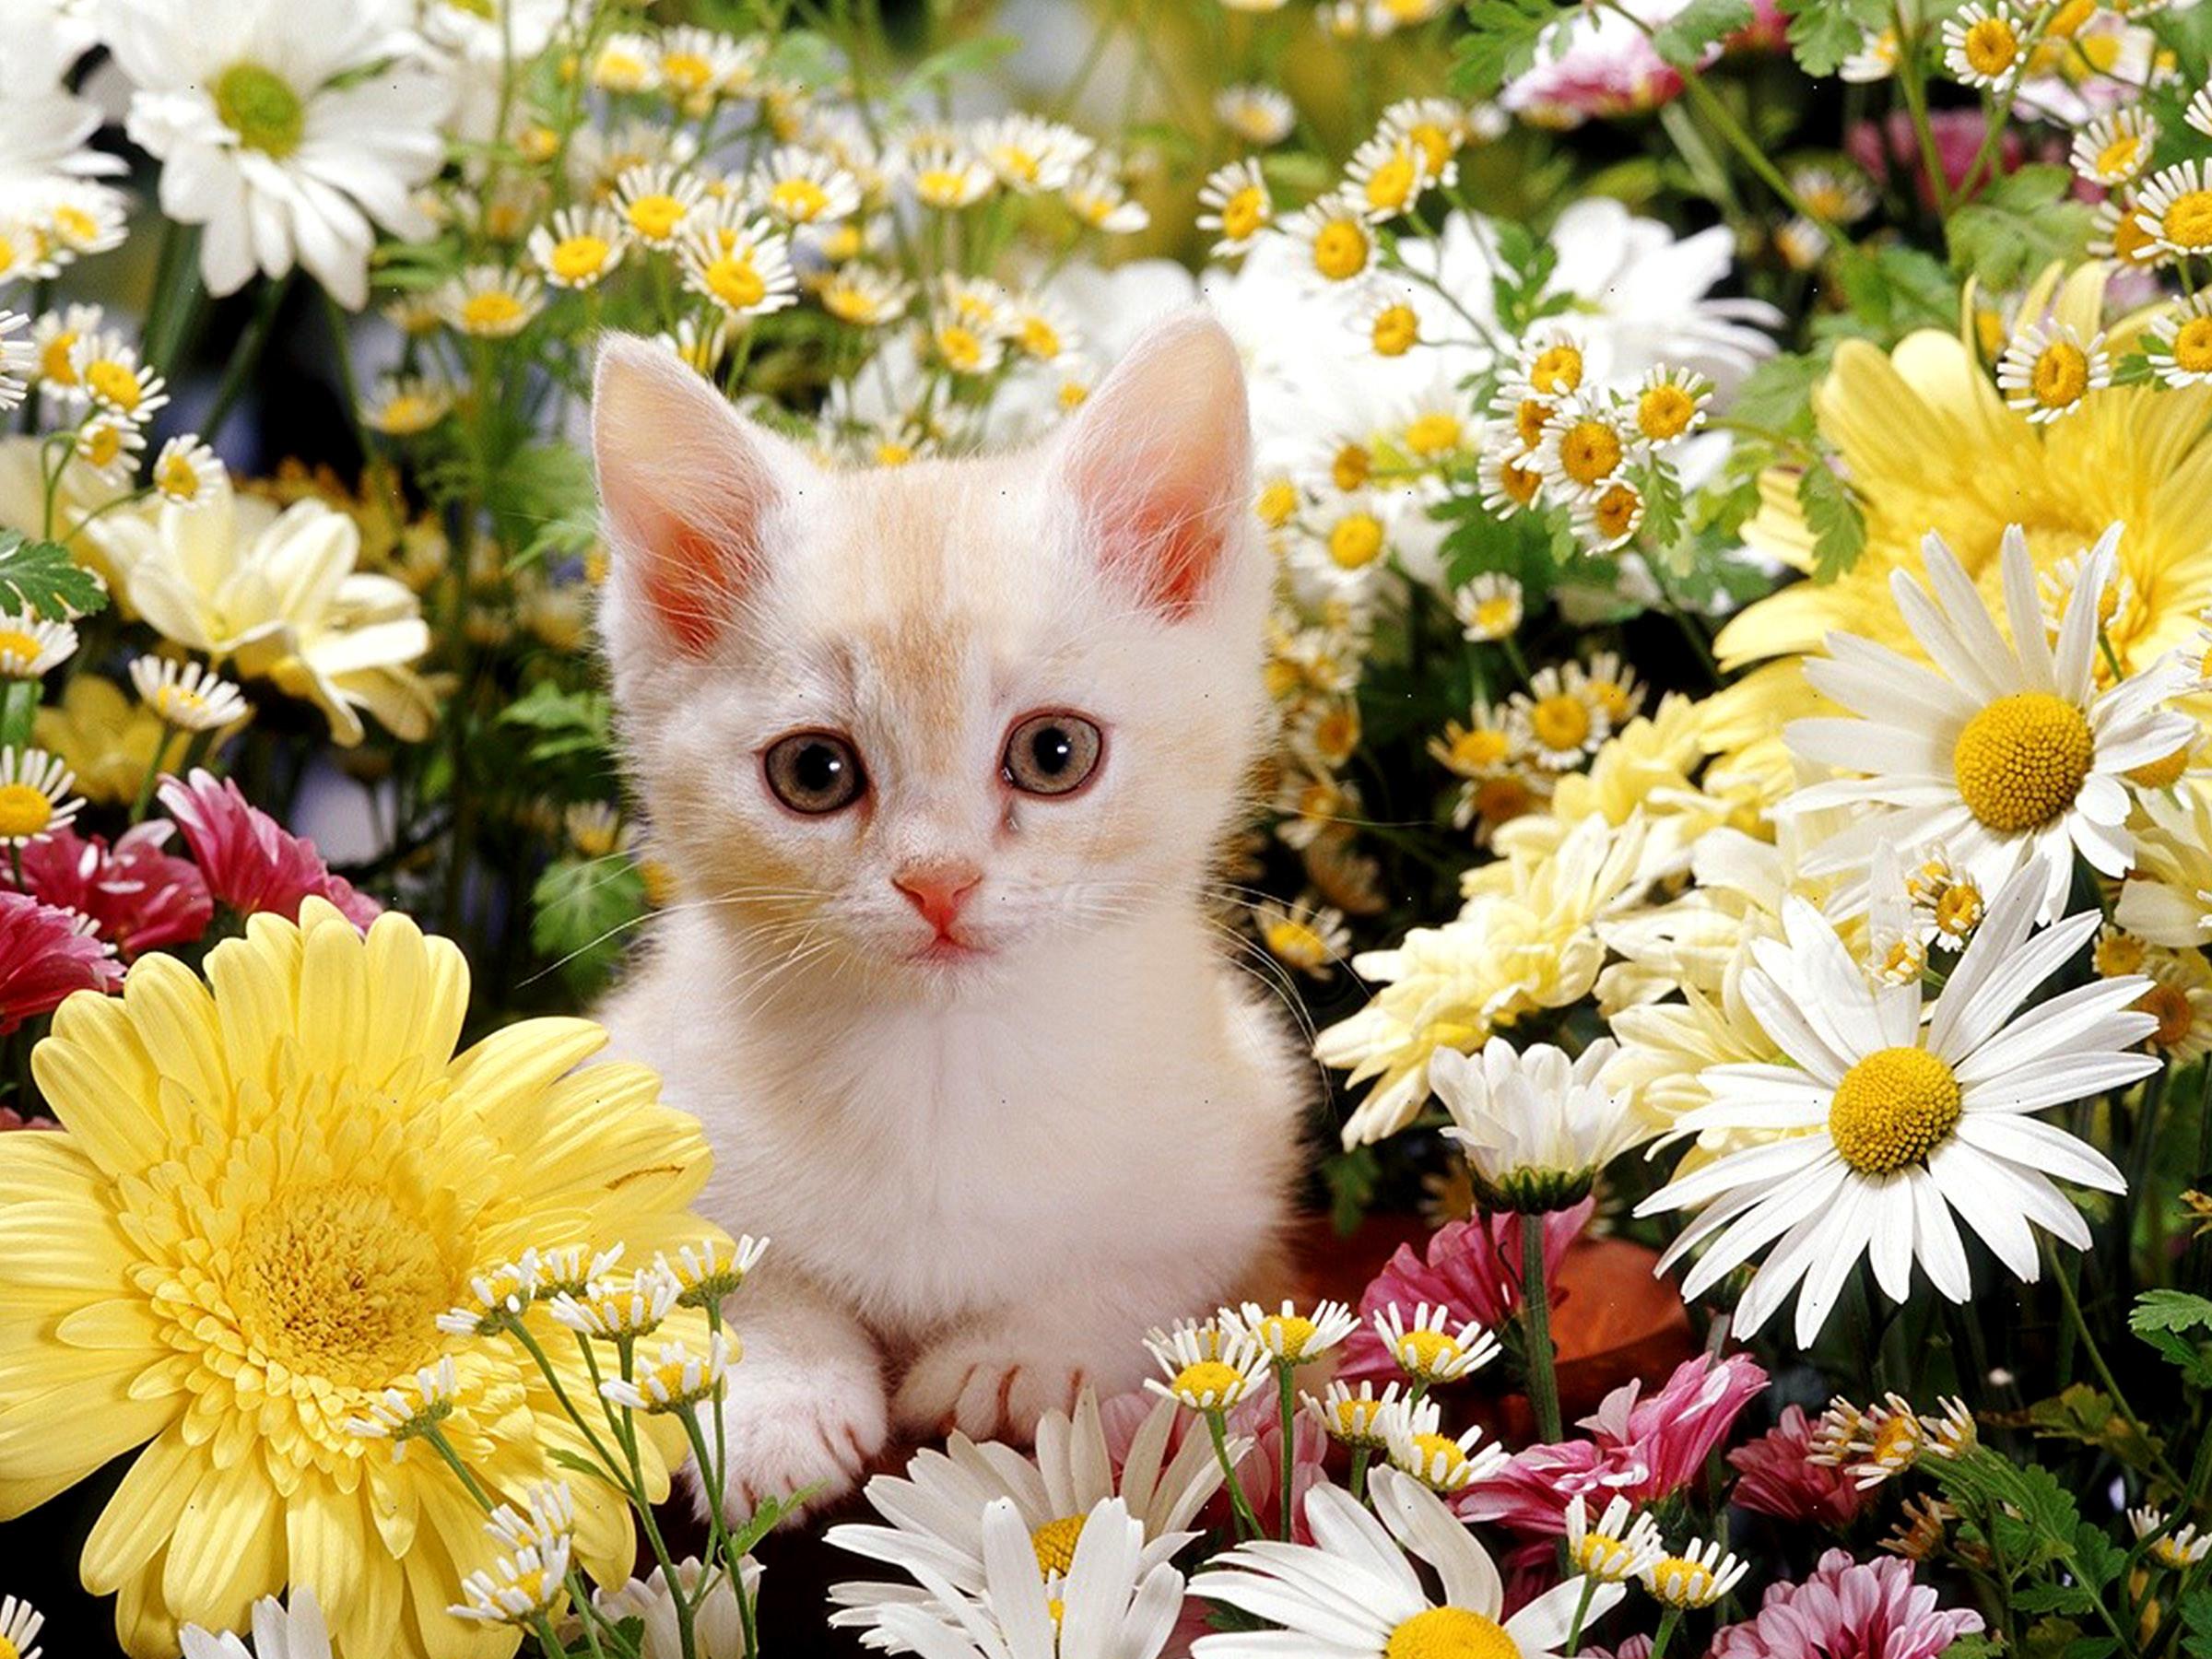 Cute kitten desktop wallpaper 60 images - Cute kittens hd wallpaper free download ...